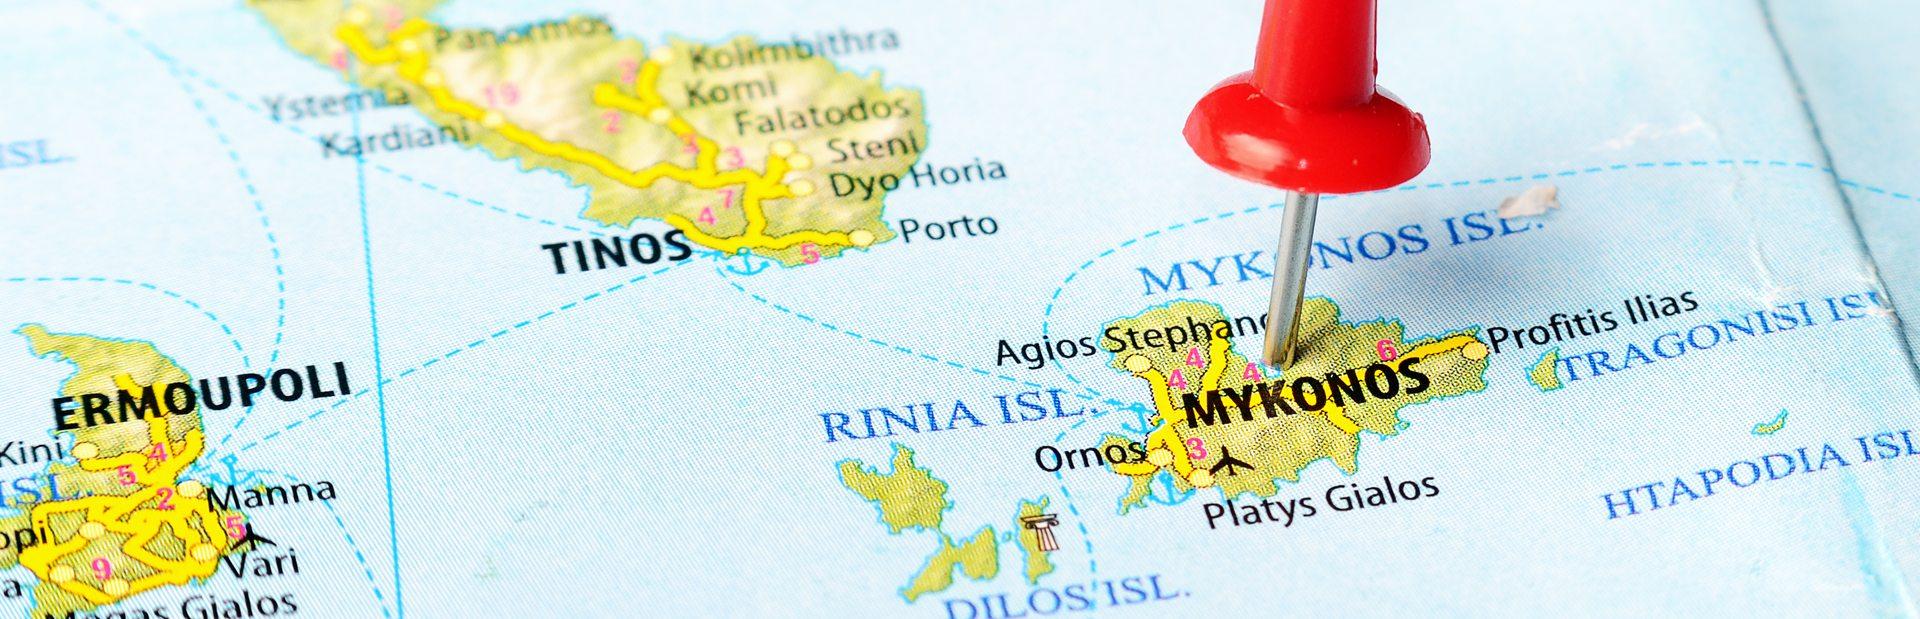 Mykonos interactive map